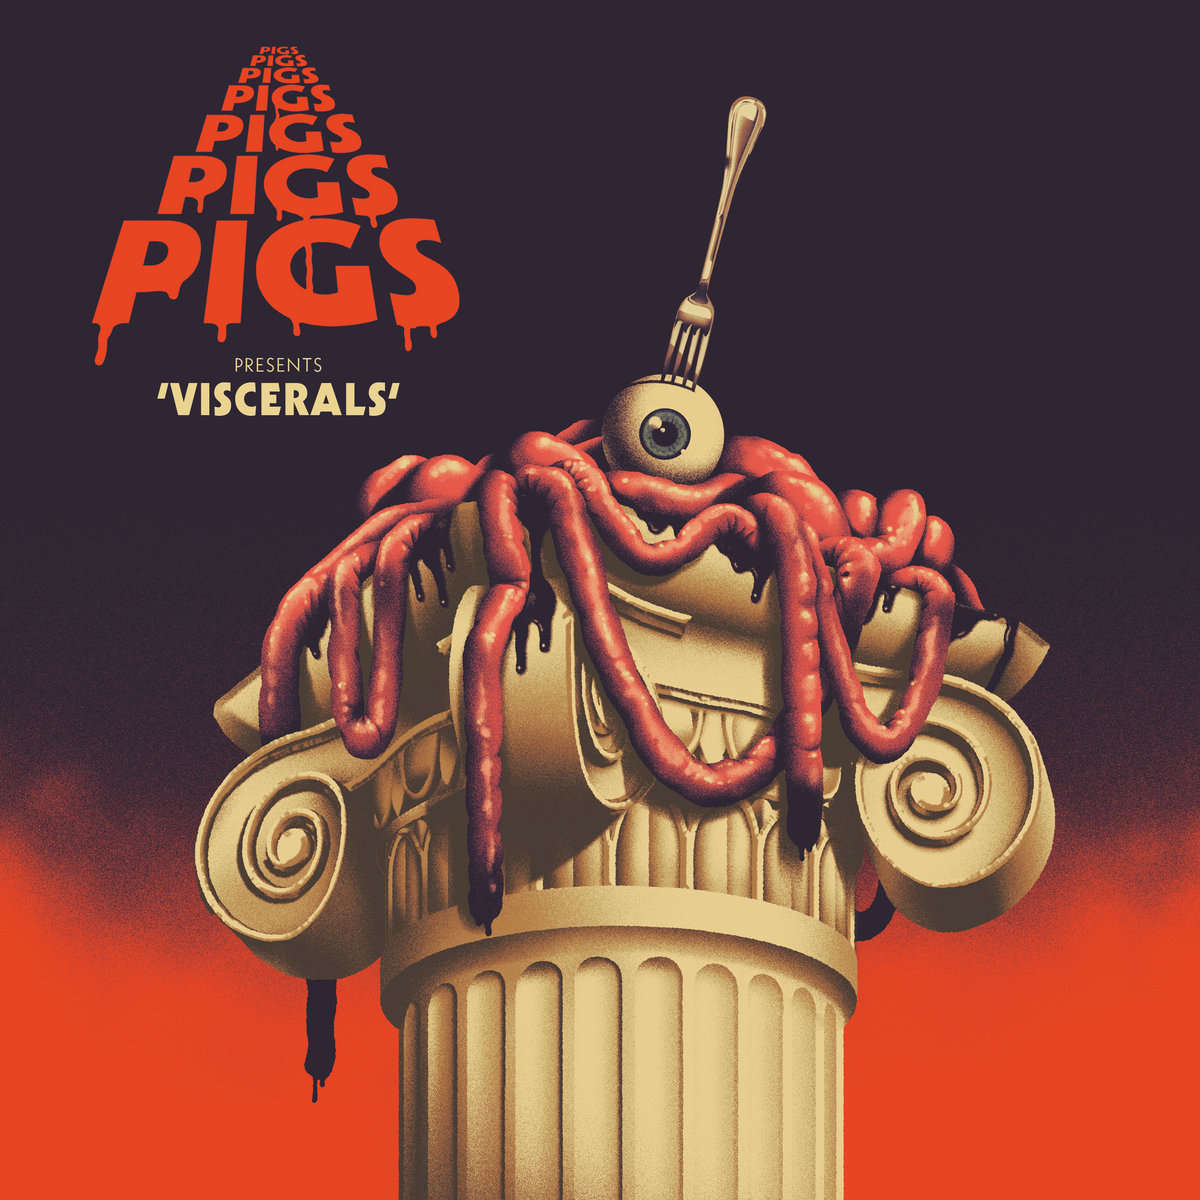 Pigs Pigs Pigs Pigs Pigs Pigs Pigs - Viscerals LP